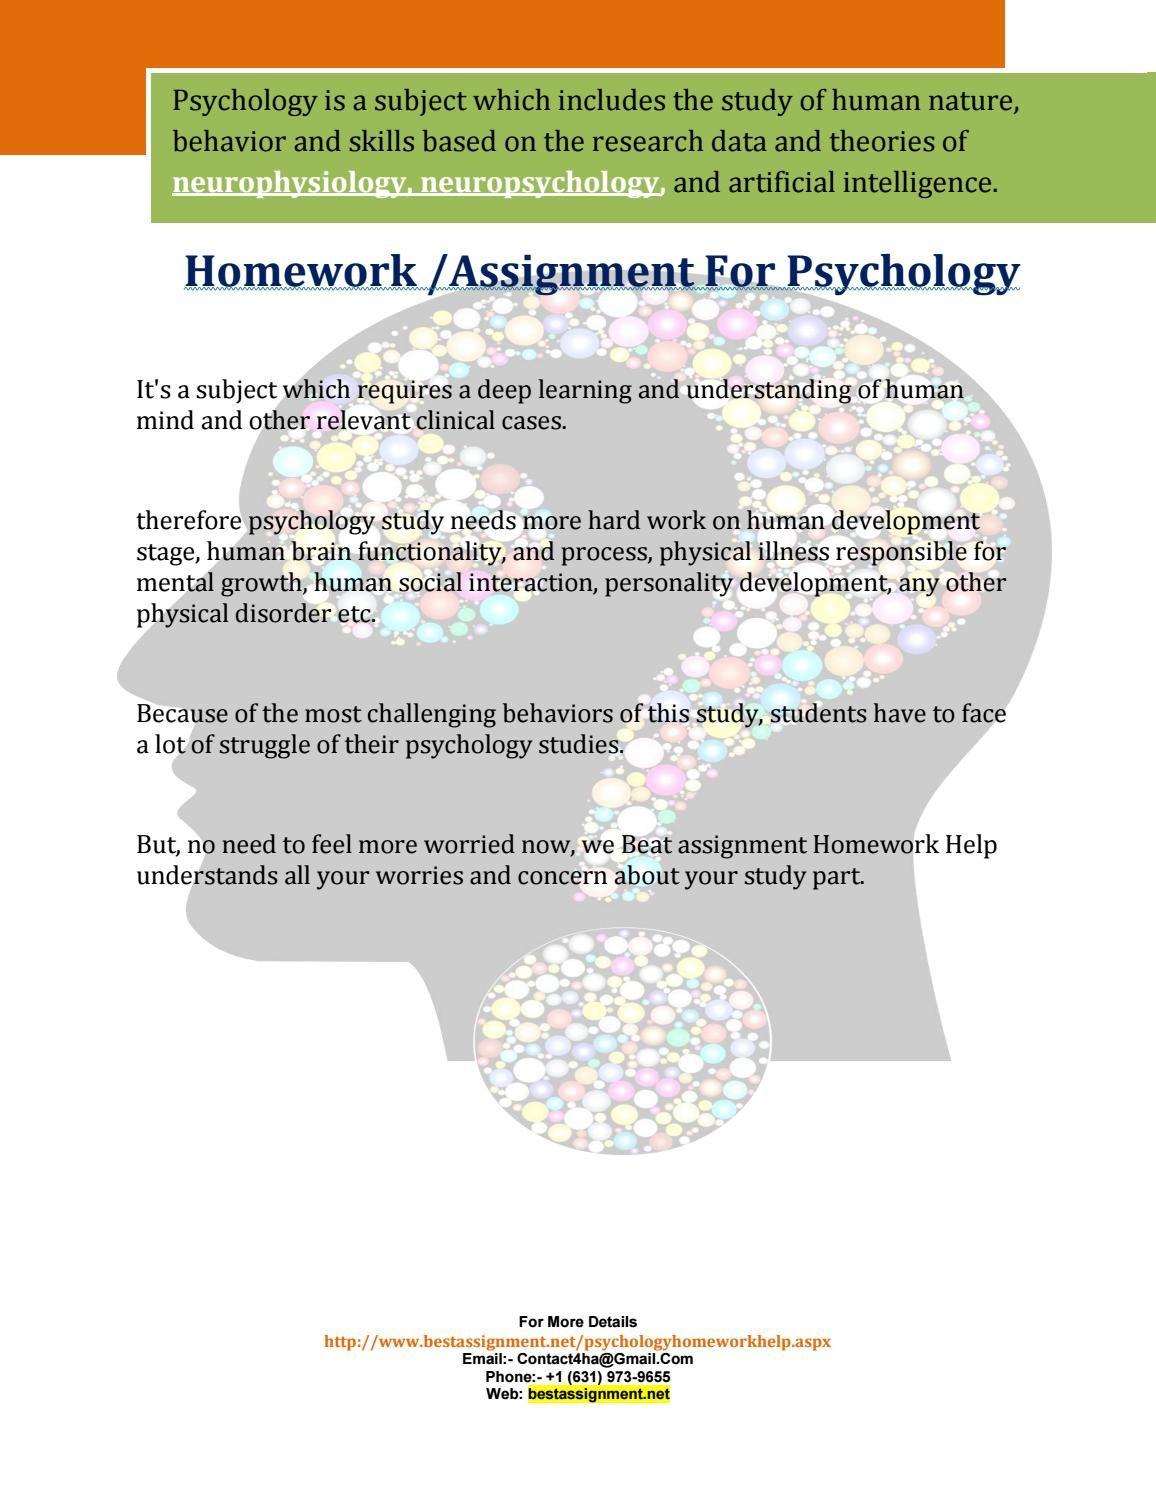 psychology homework help